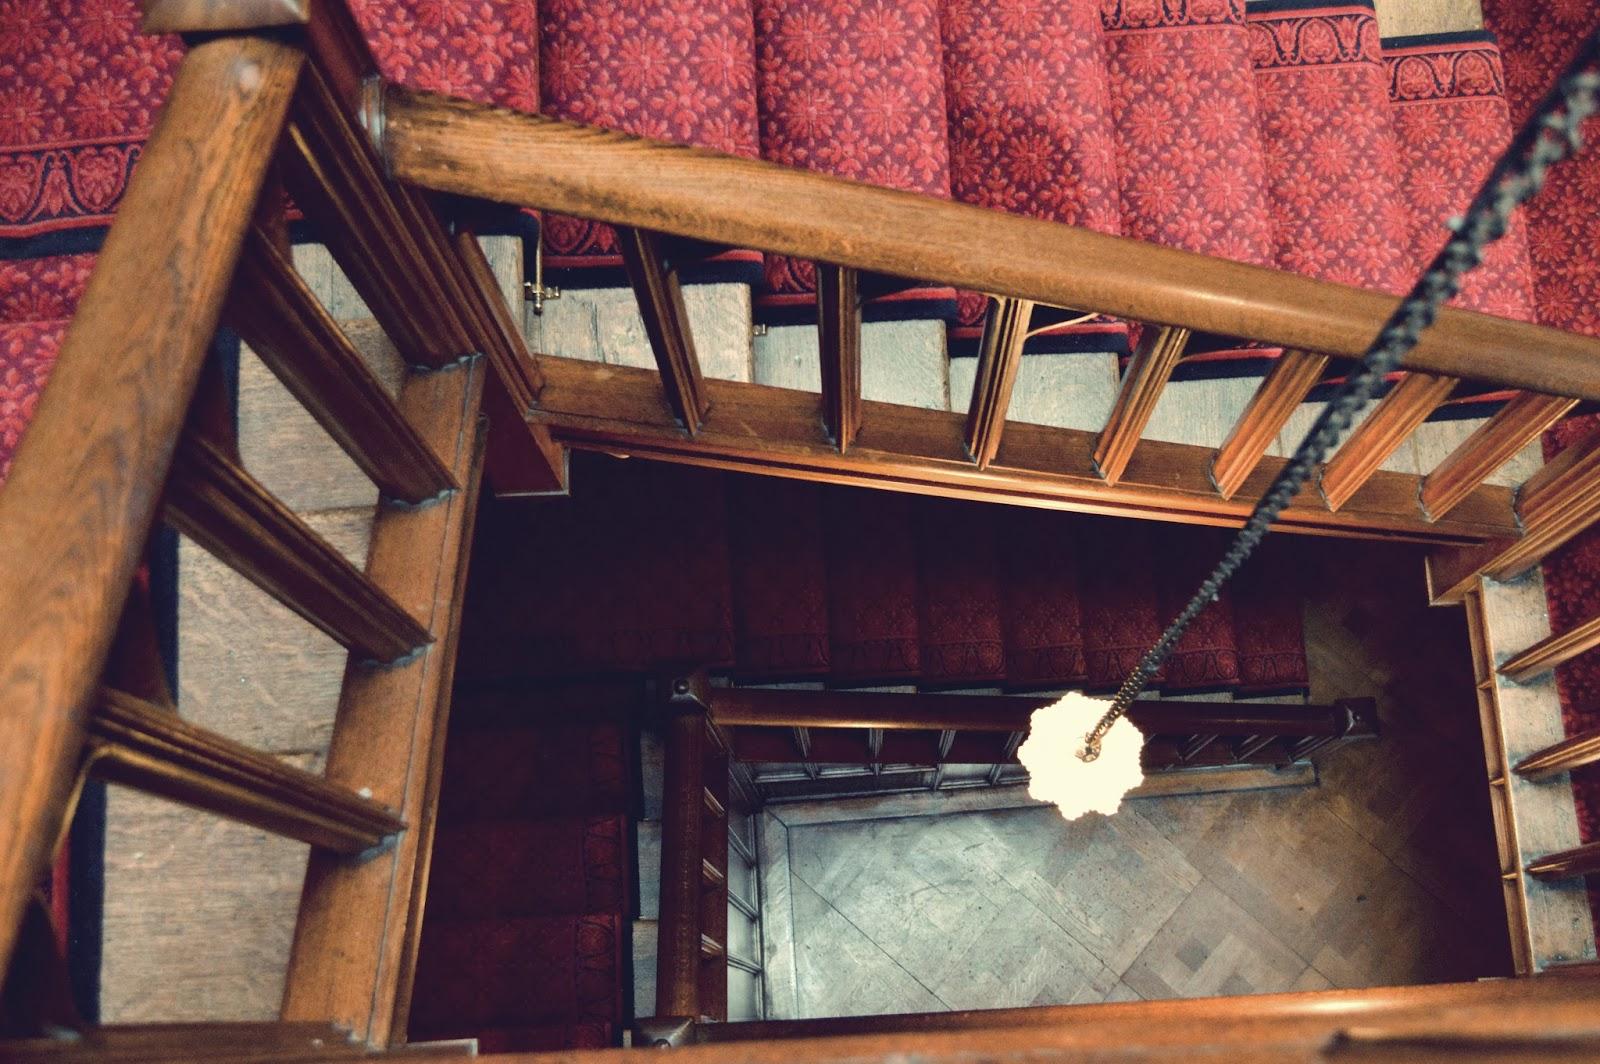 Hughenden Manor, interior, National Trust, 18th century, Victorian, library, visit, Uk, Buckinghamshire, photo, photography, inside, Benjamin  Disraeli, prime minister, staircase